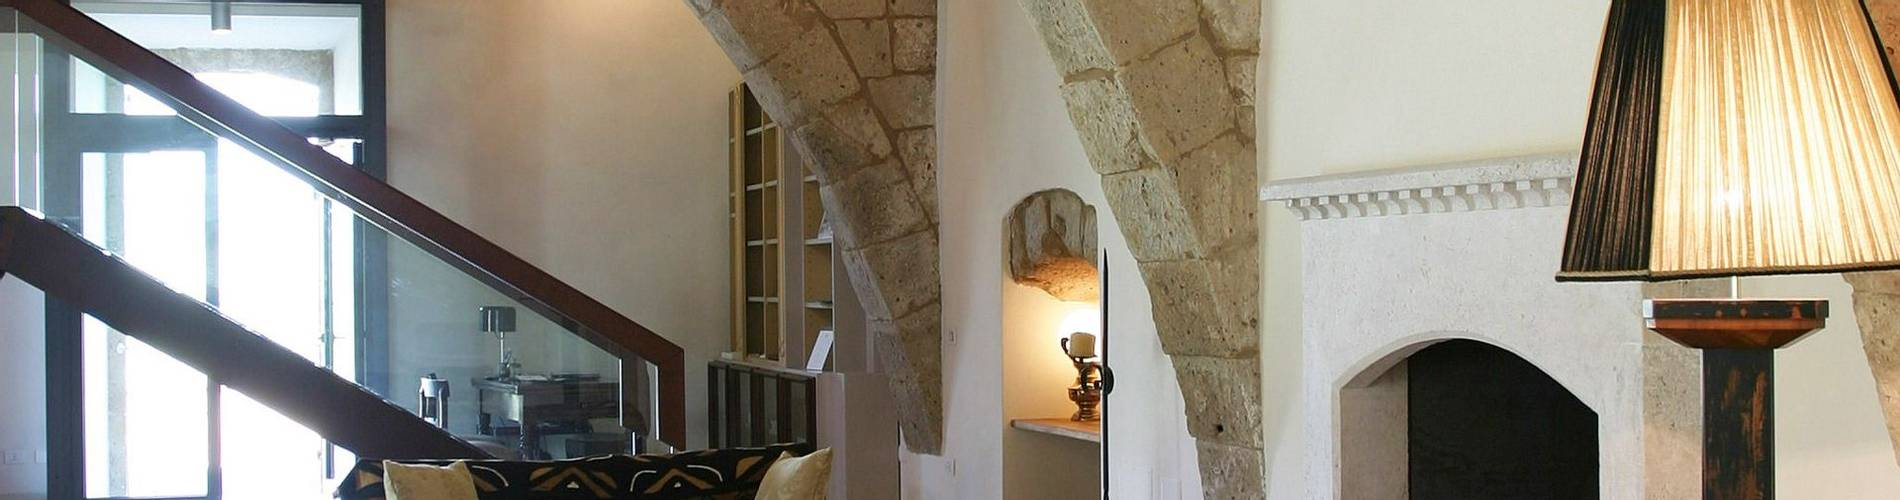 Locanda Palazzone, Umbria, Italy (21).jpg